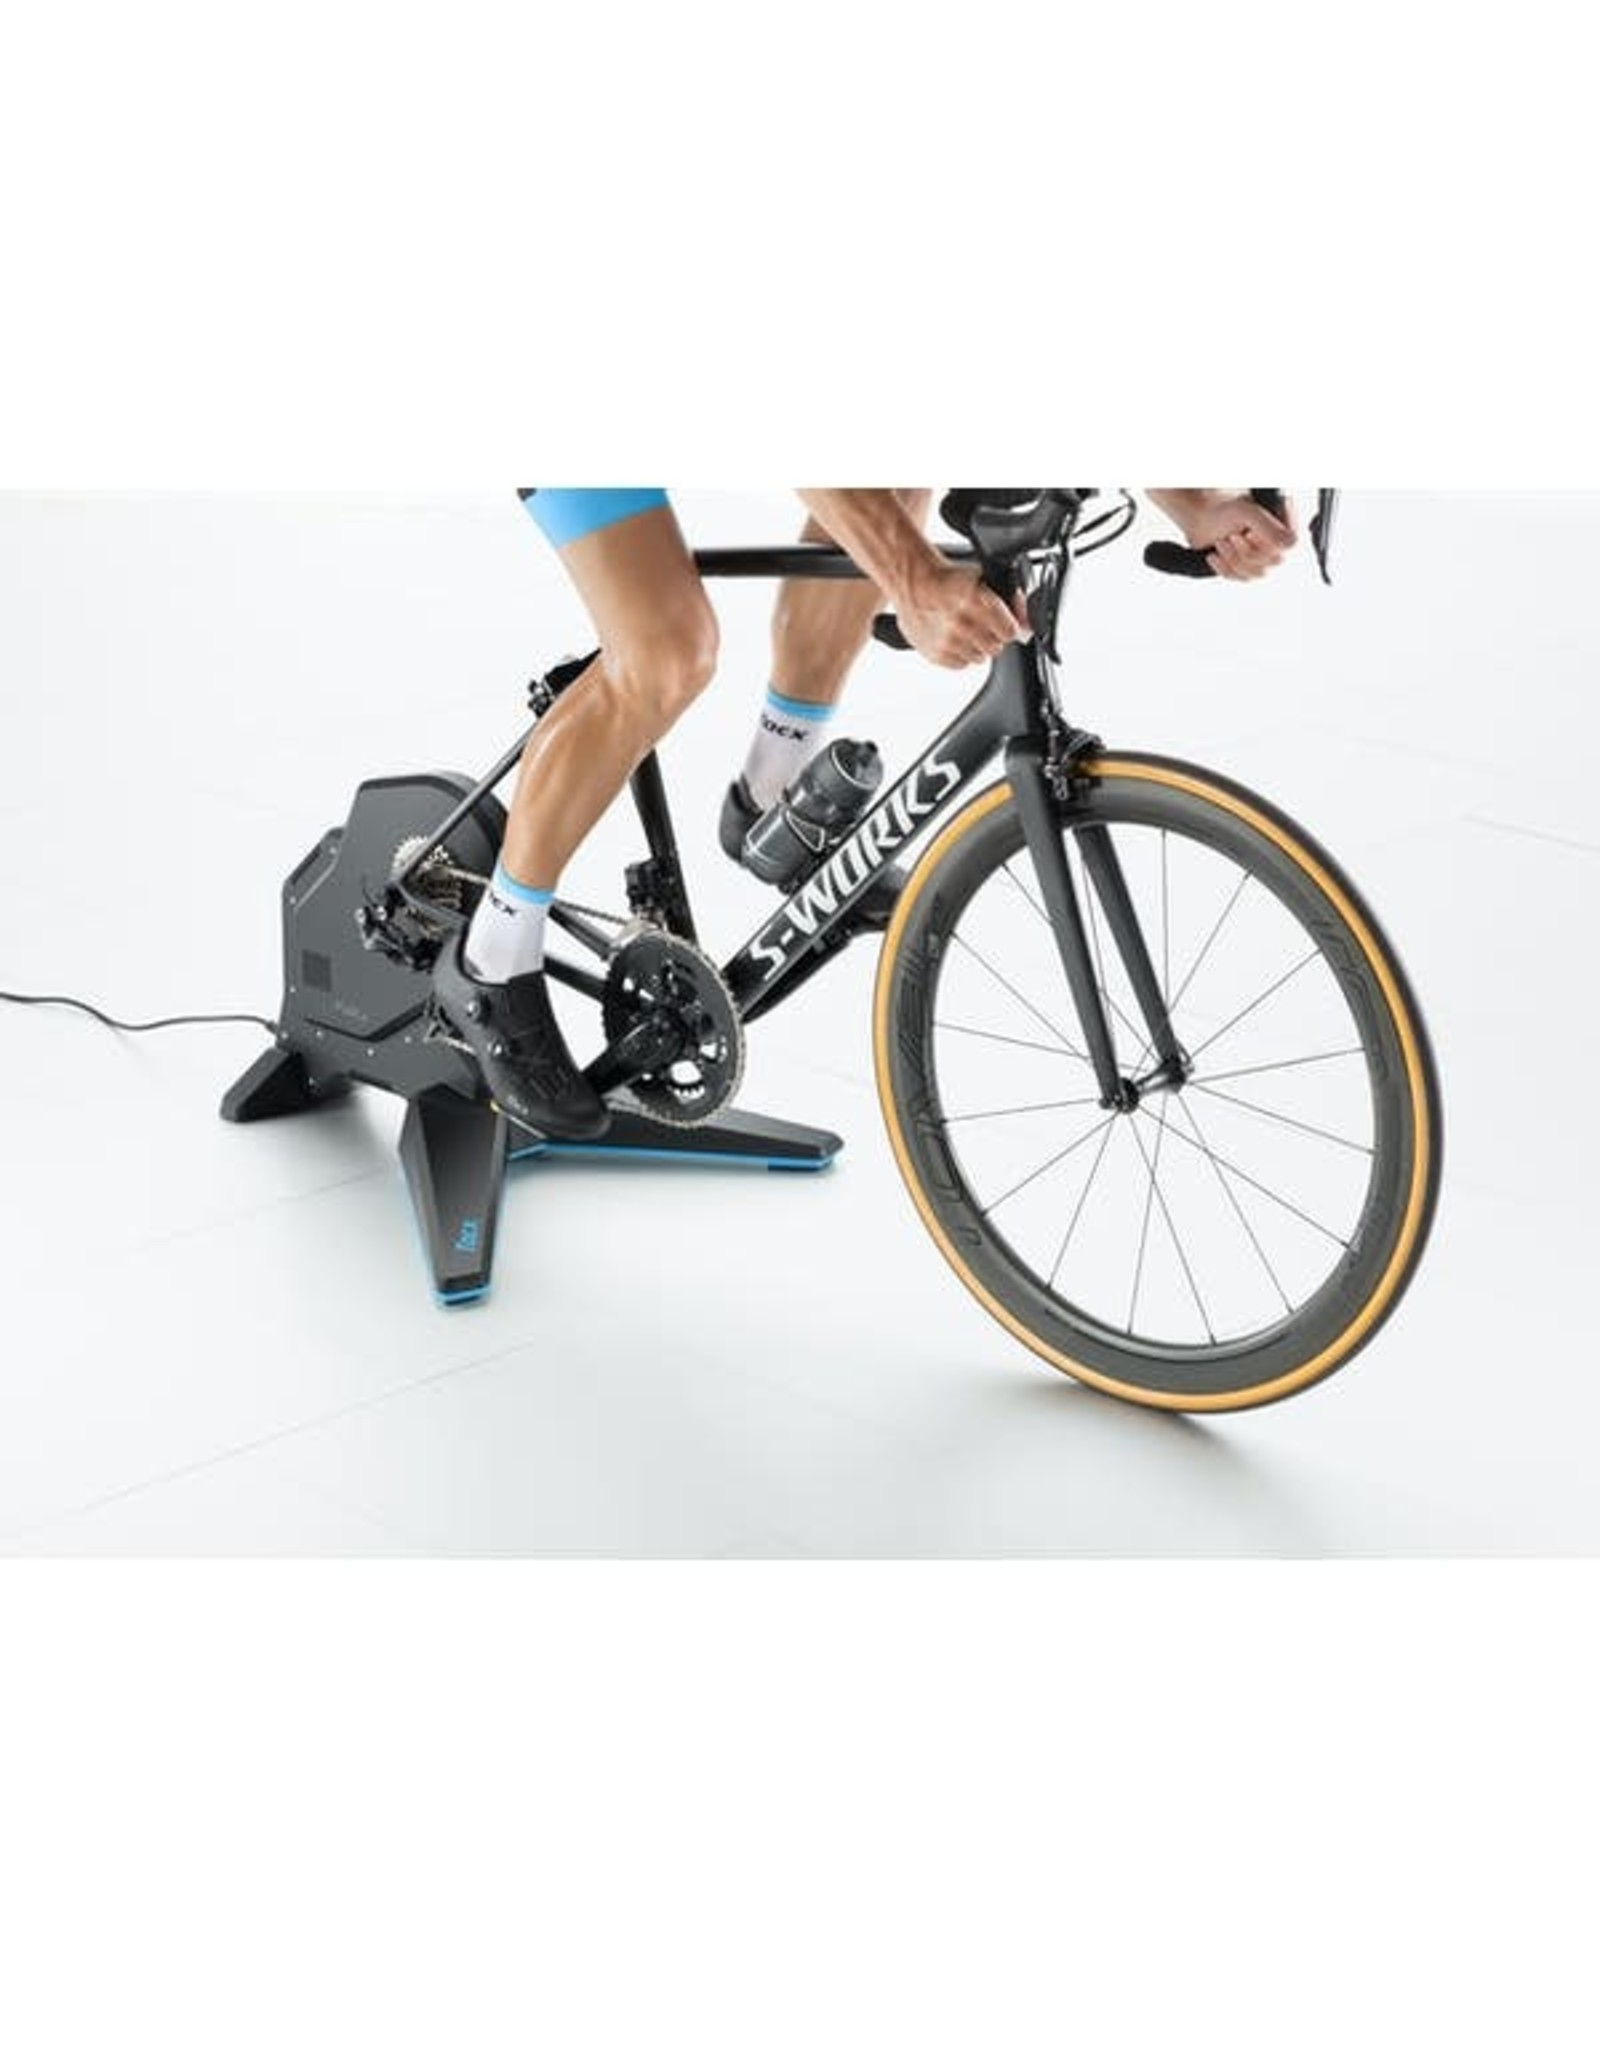 Tacx Tacx Flux 2 Smart Trainer Magnetic